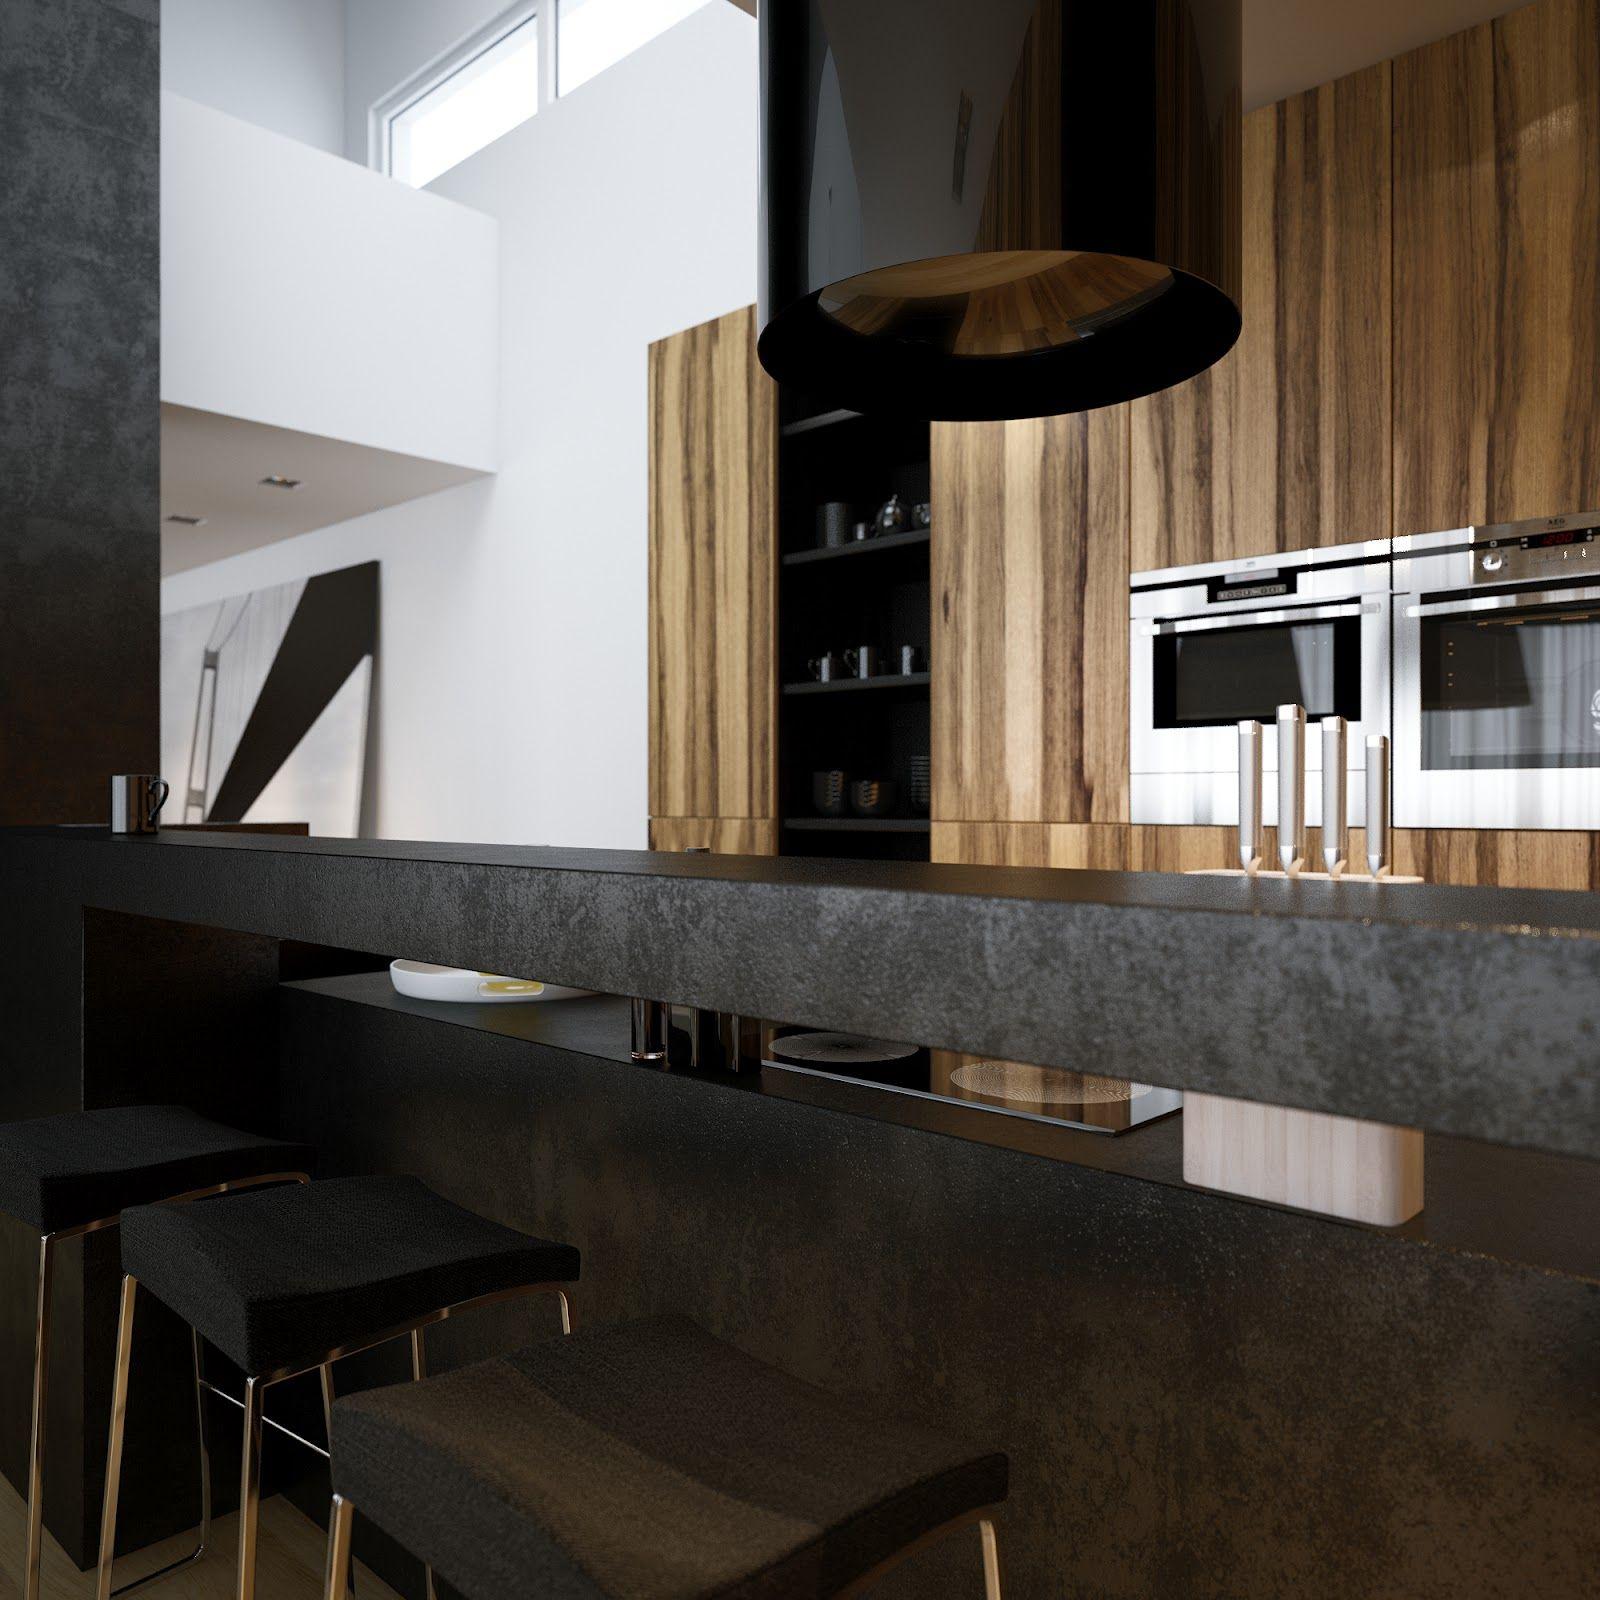 Luxury Minimalist Loft Designs in Black and White Image 21